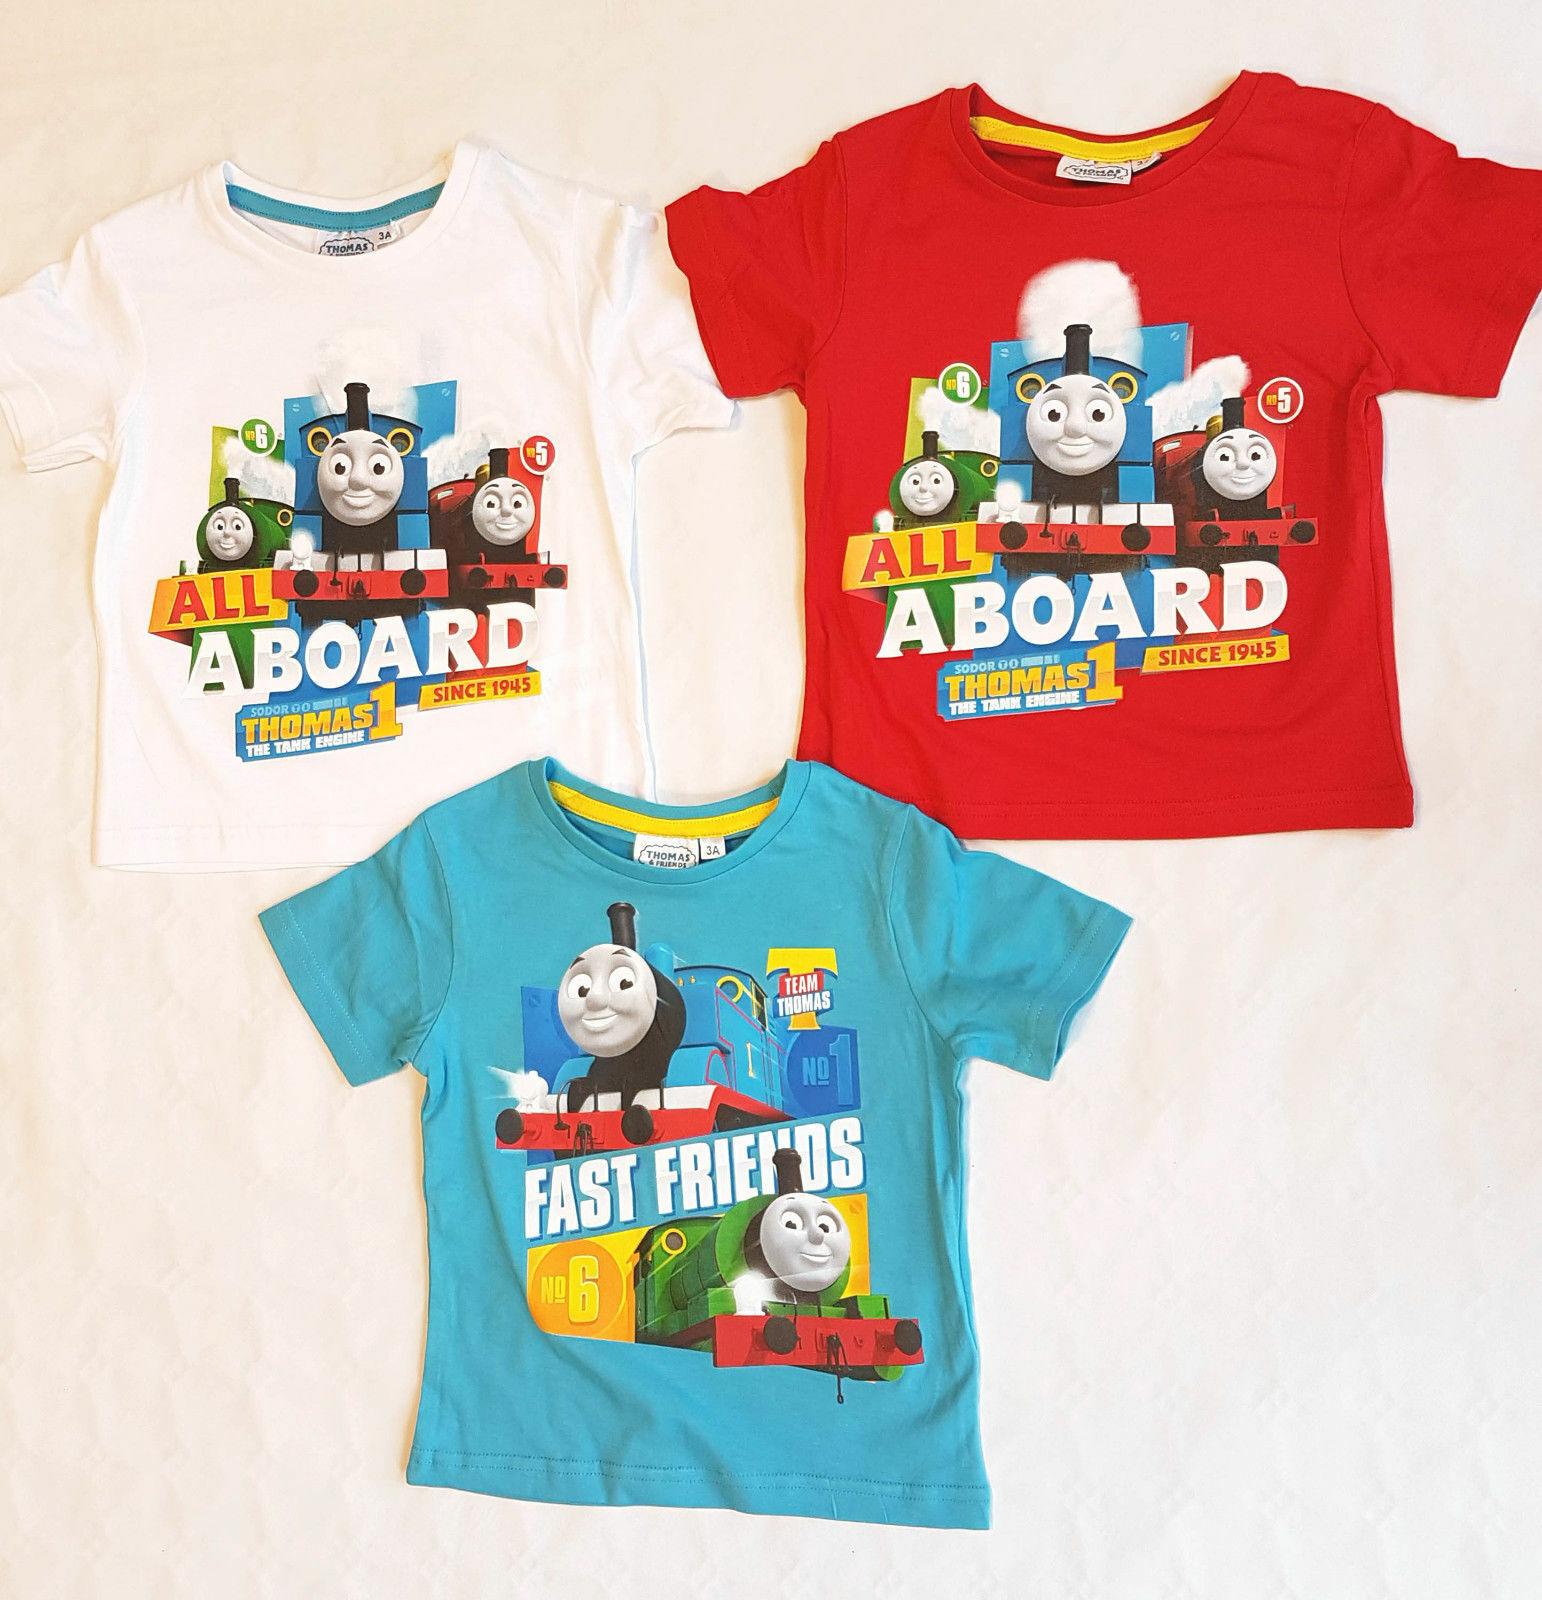 Thomas und  seine Freunde Kinder Jungen kurzarm T-Shirt Gr. 92-110 Shirt  neu!